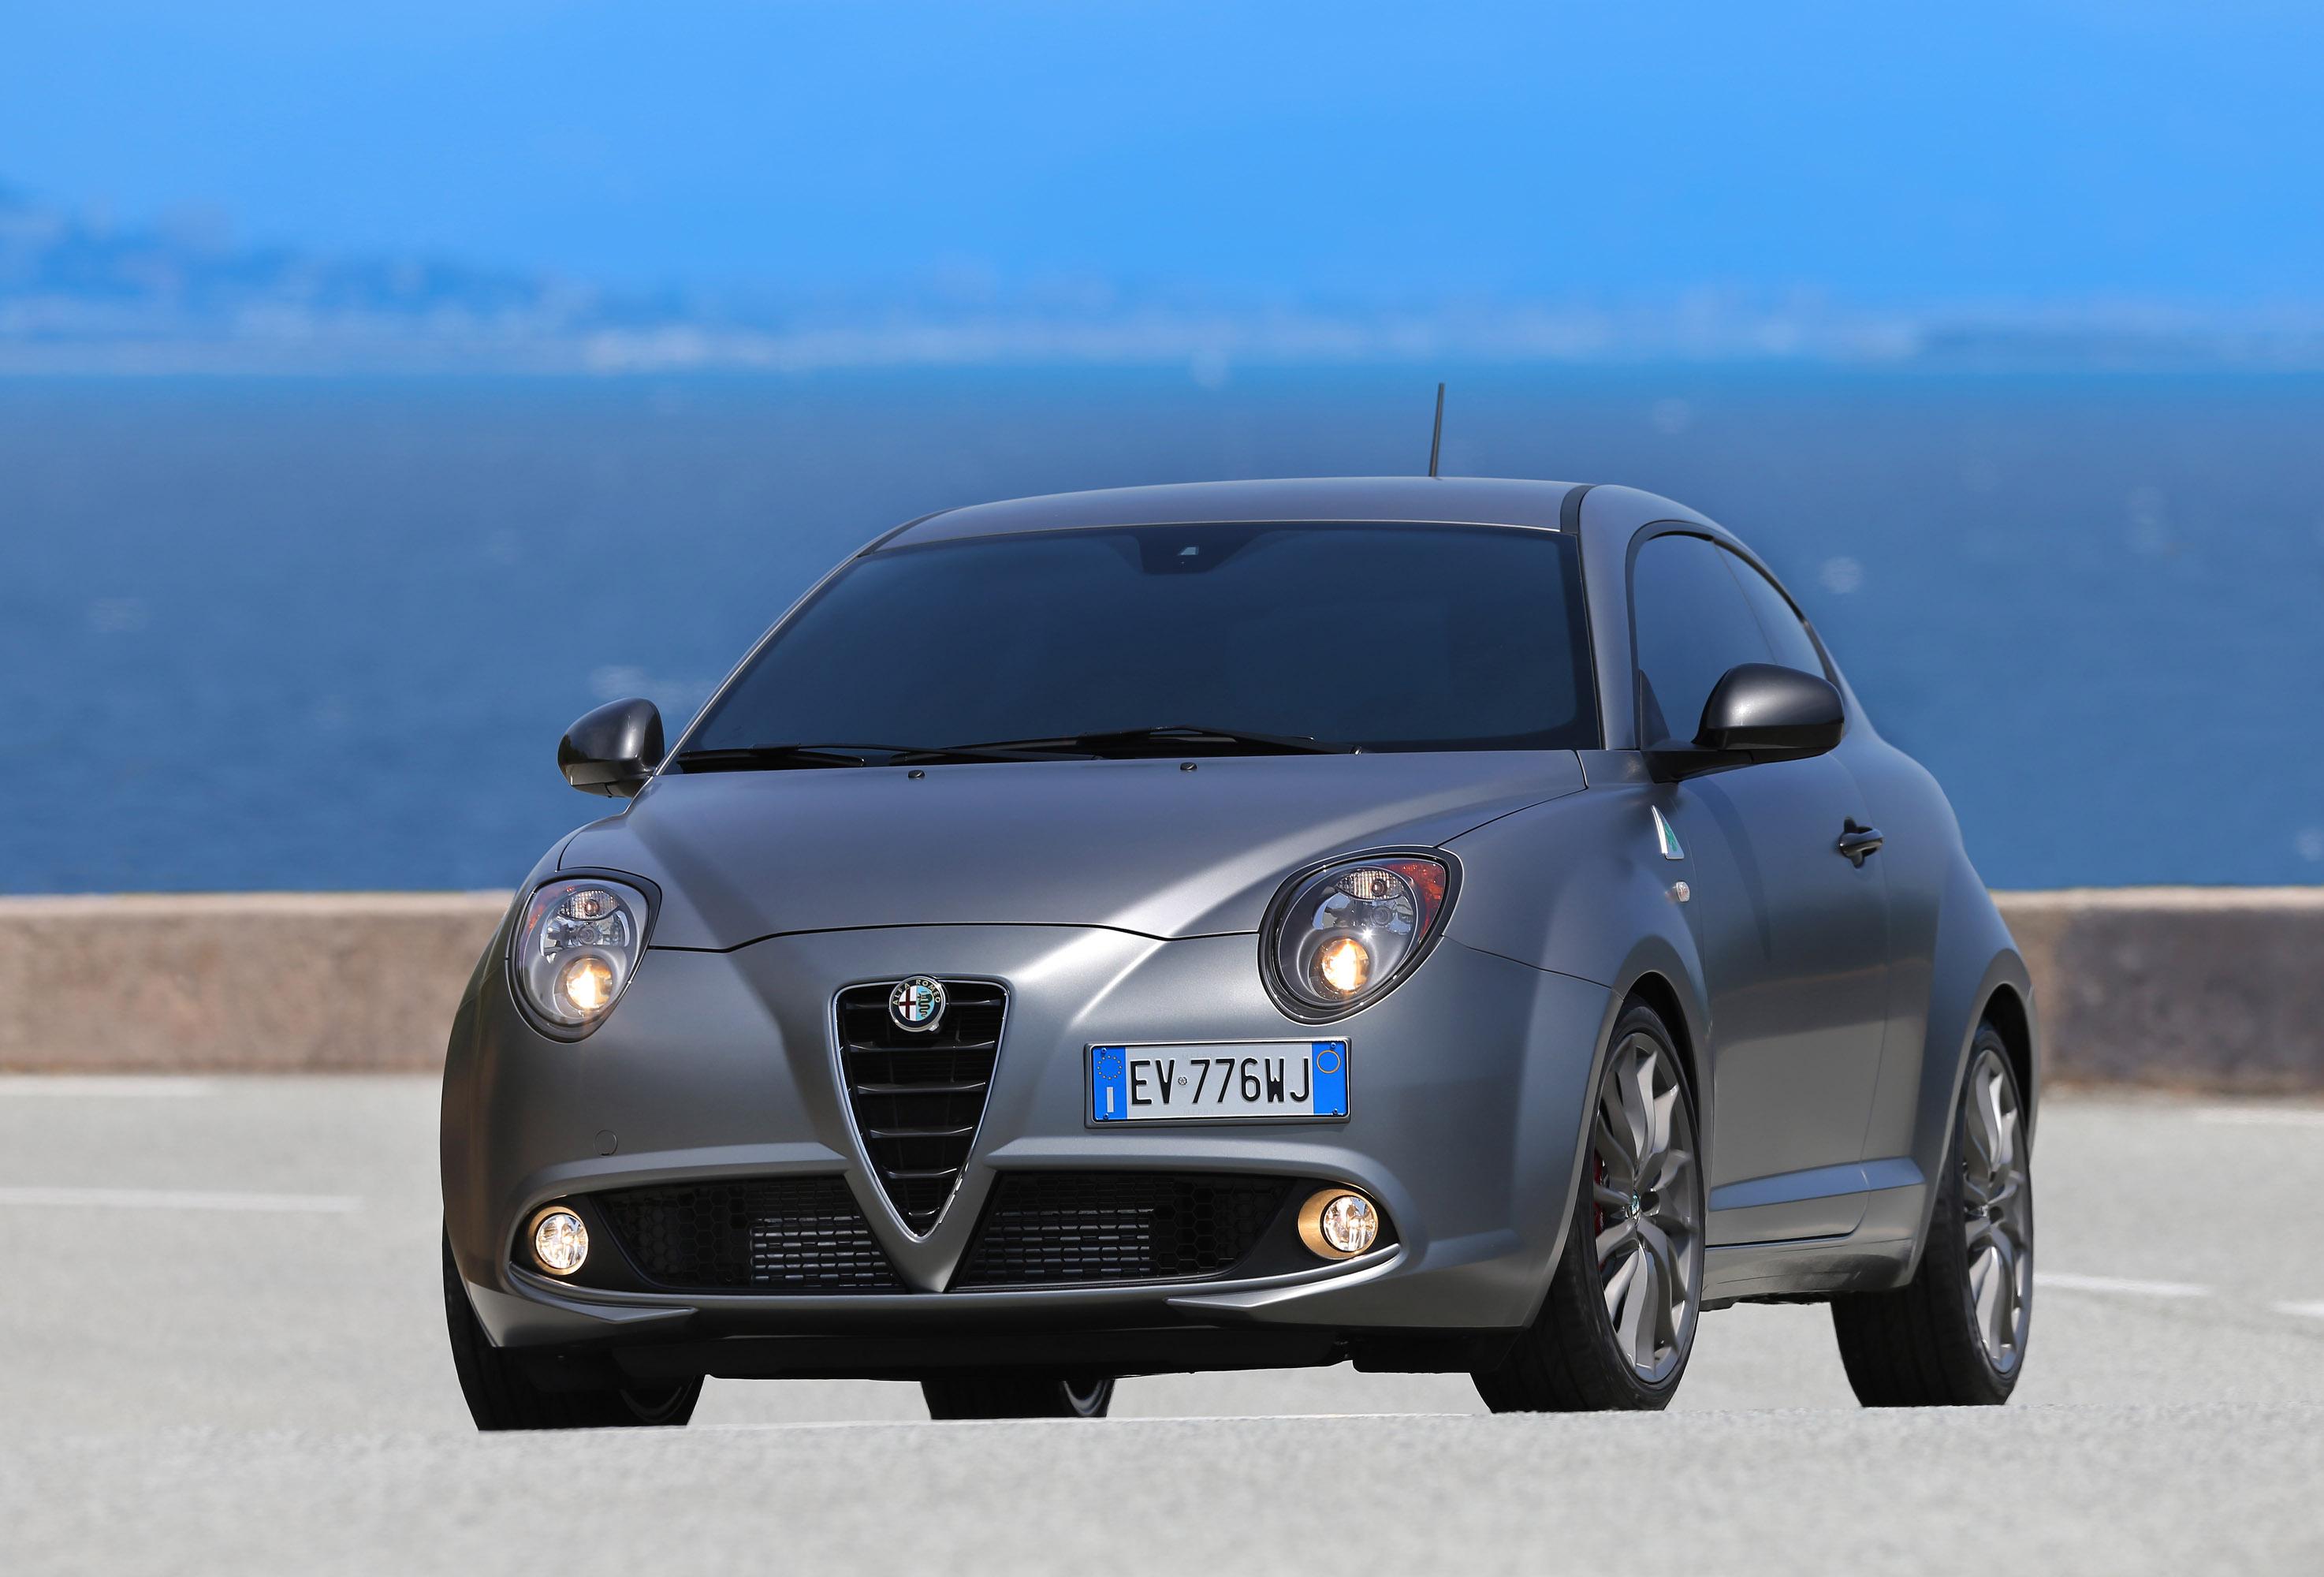 Alfa Romeo MiTo Quadrifoglio Verde photo #1